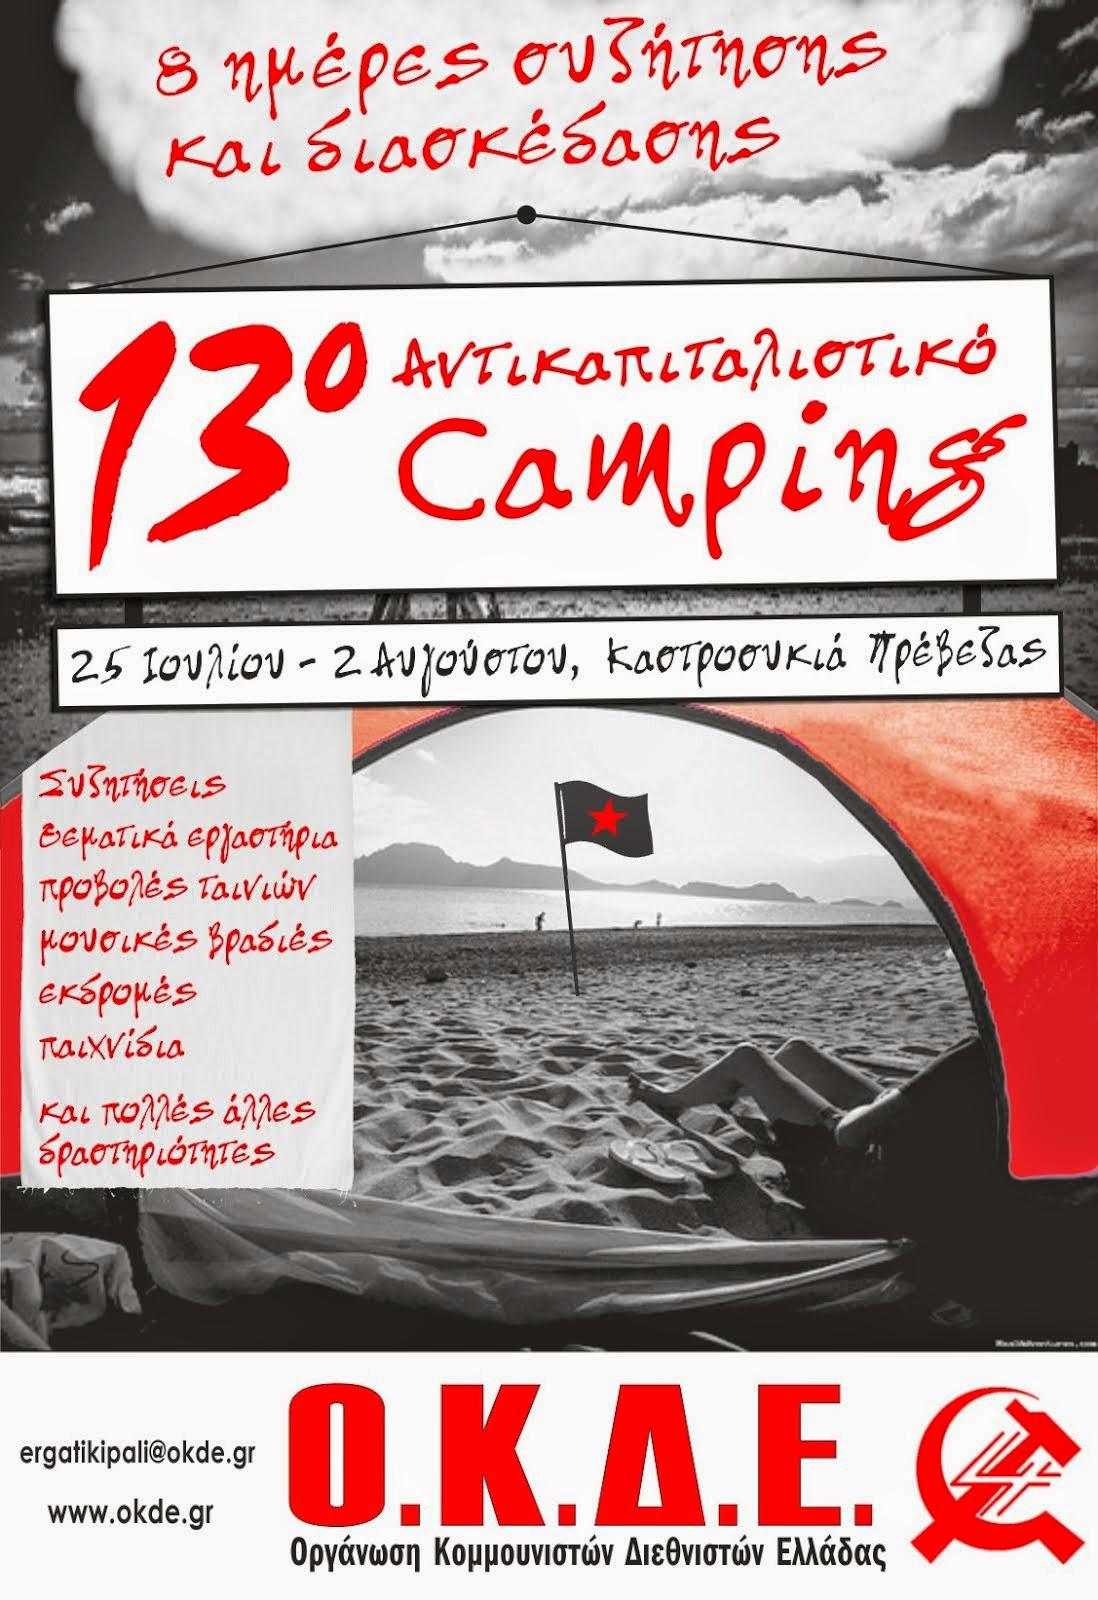 13o Αντικαπιταλιστικό Camping